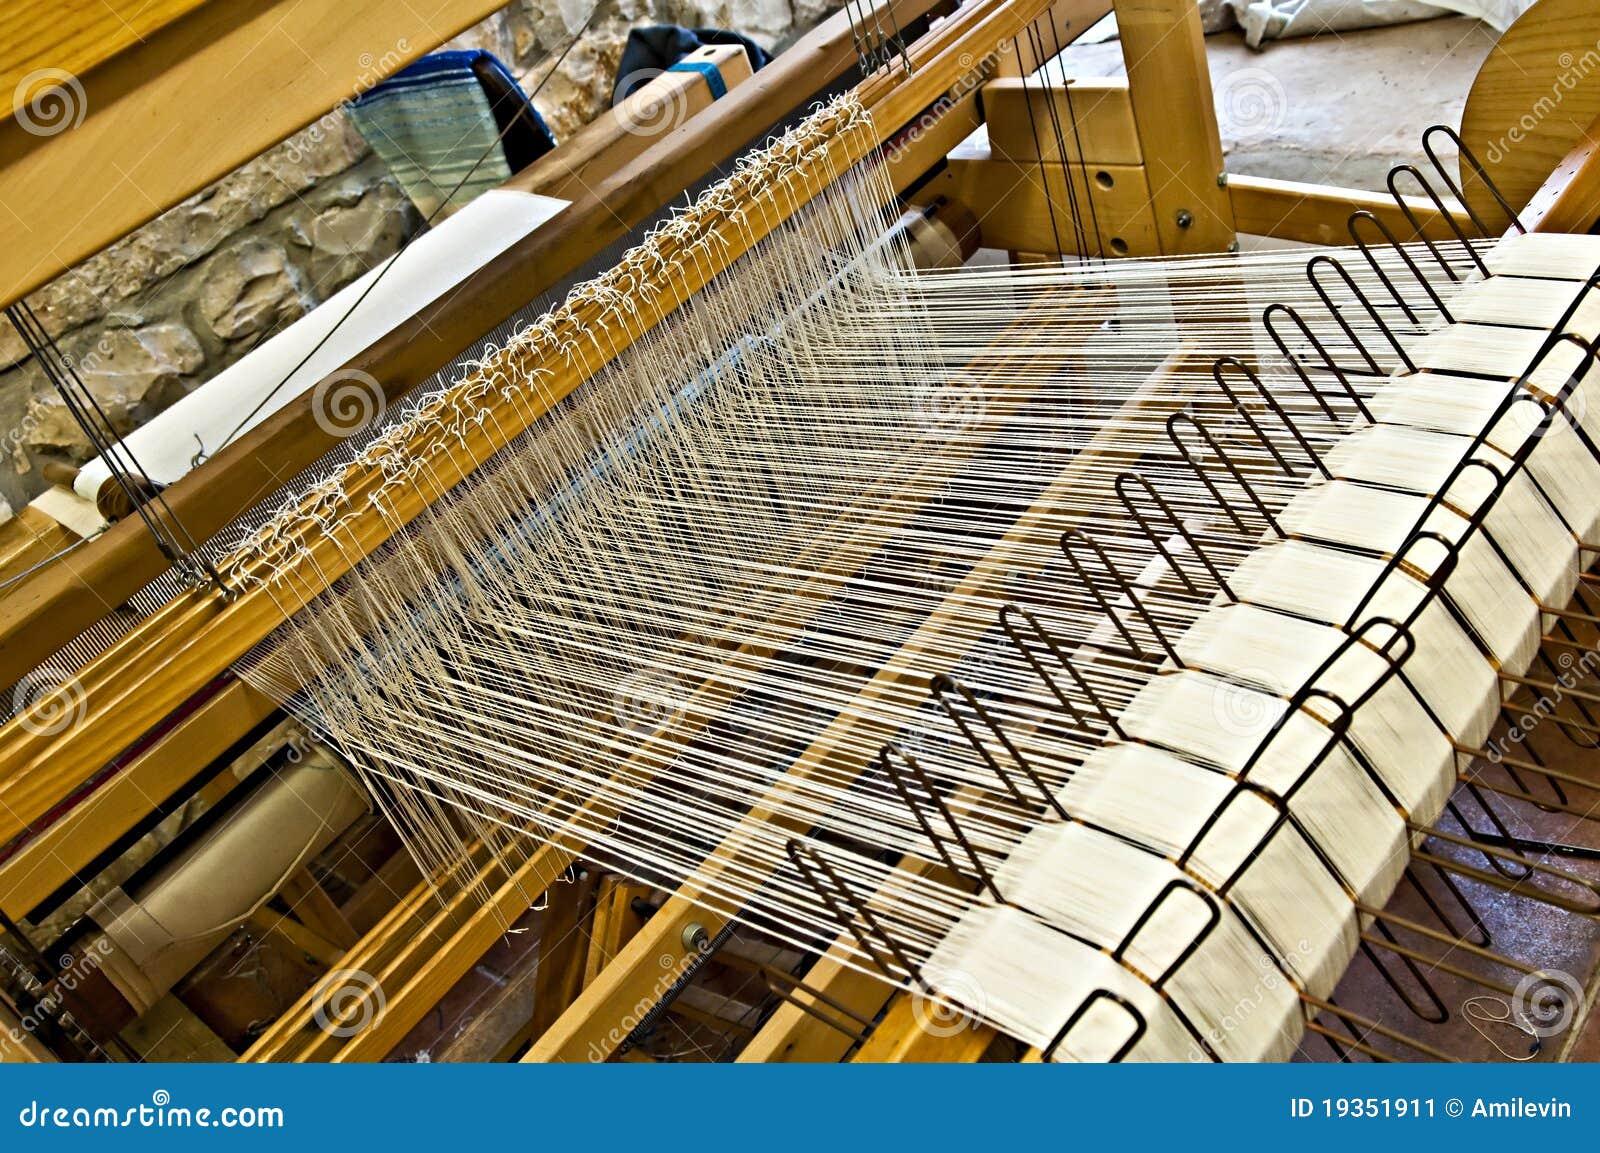 Weaving Machine Stock Image - Image: 19351911